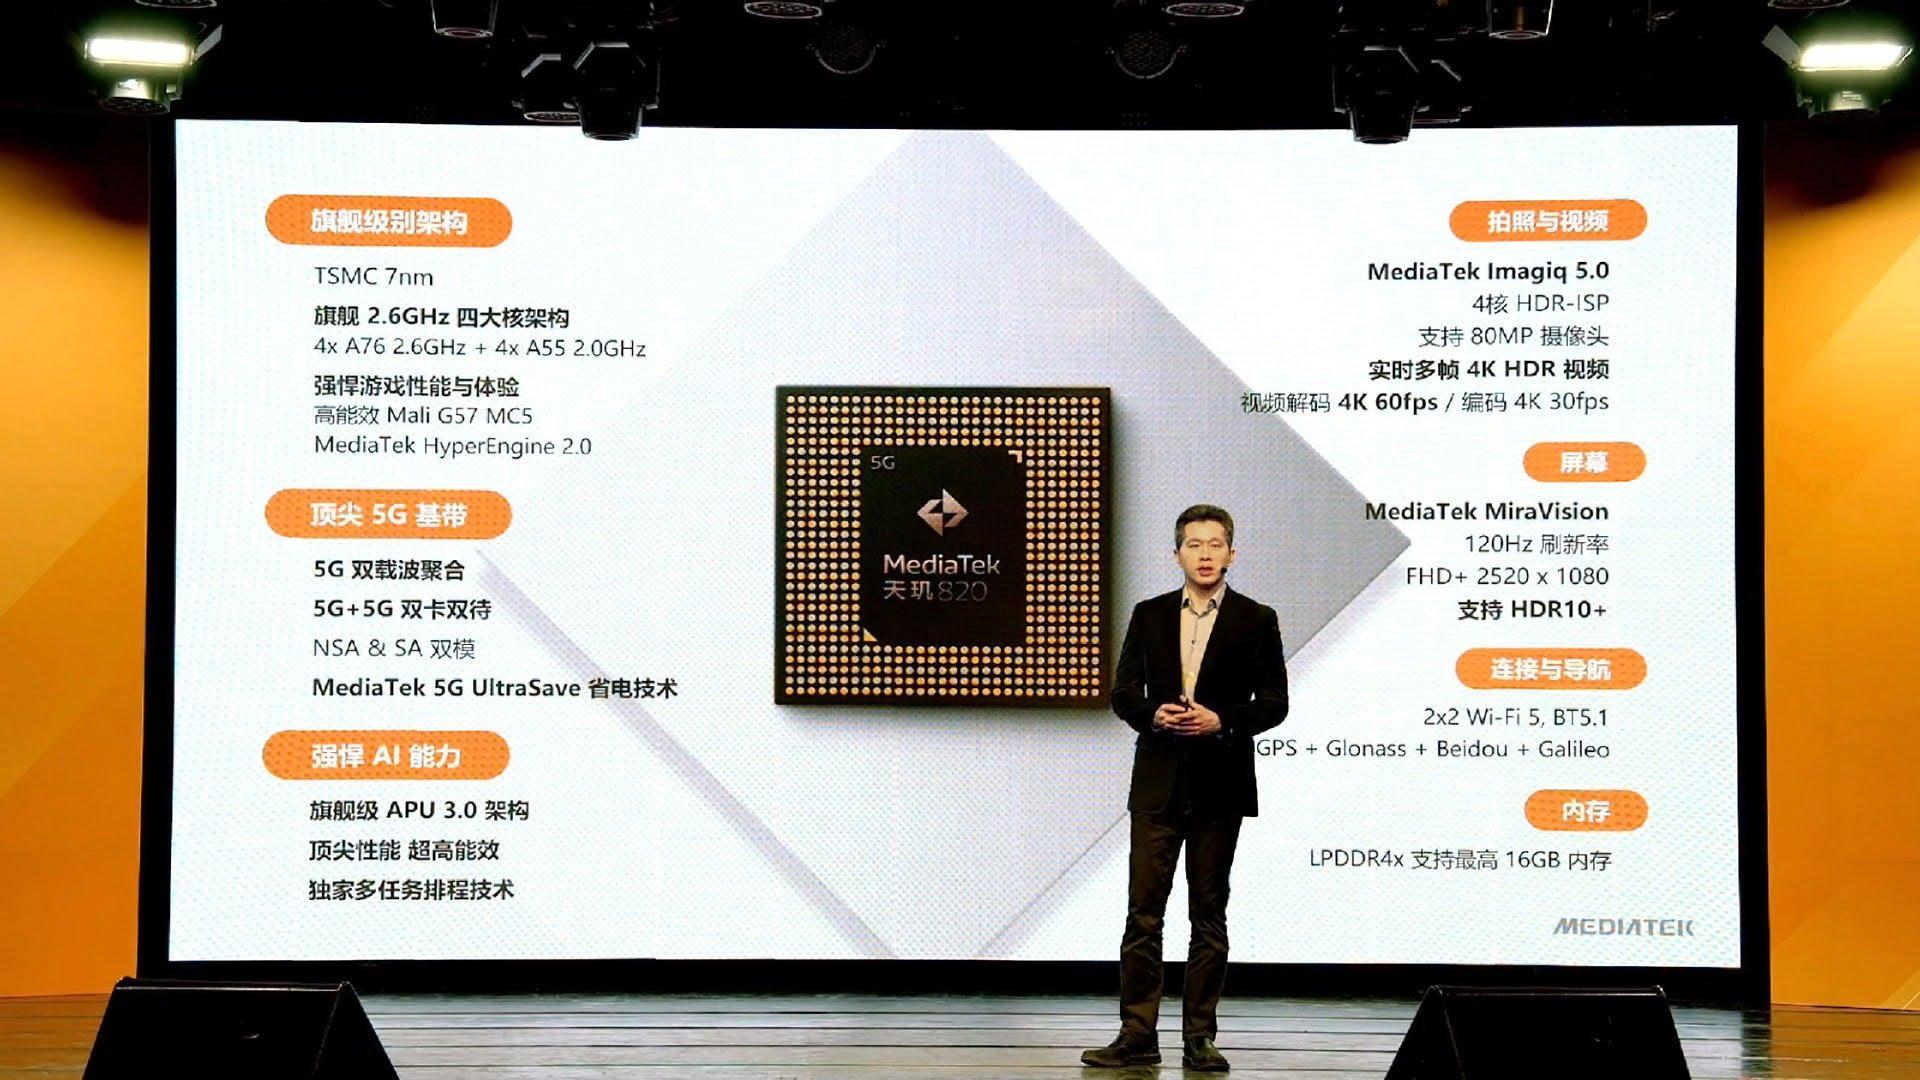 MediaTek's latest processor will help take dual-SIM 5G phones mainstream